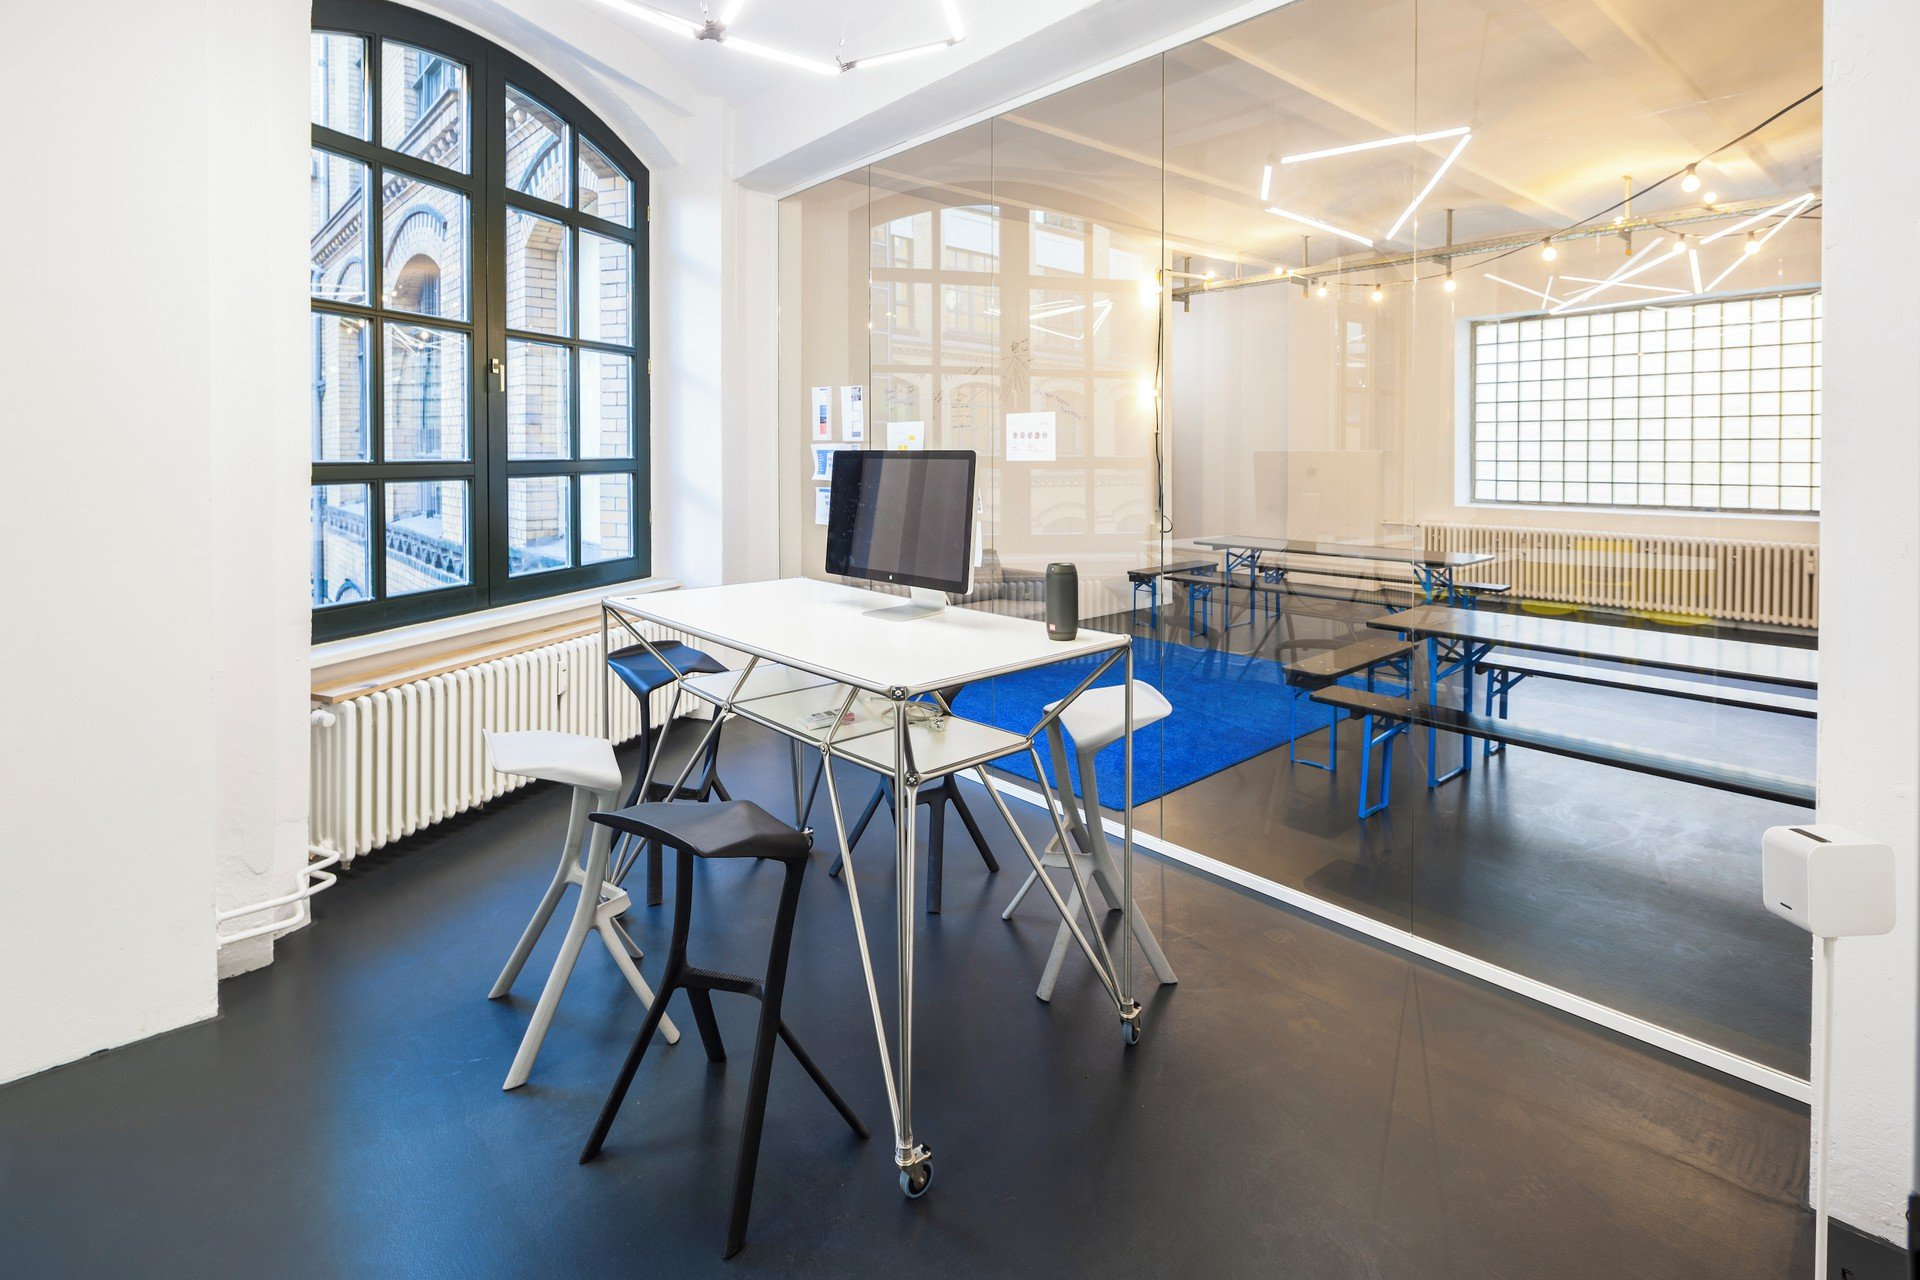 Berlin conference rooms Industriegebäude Goodpatch Meeting Room image 0